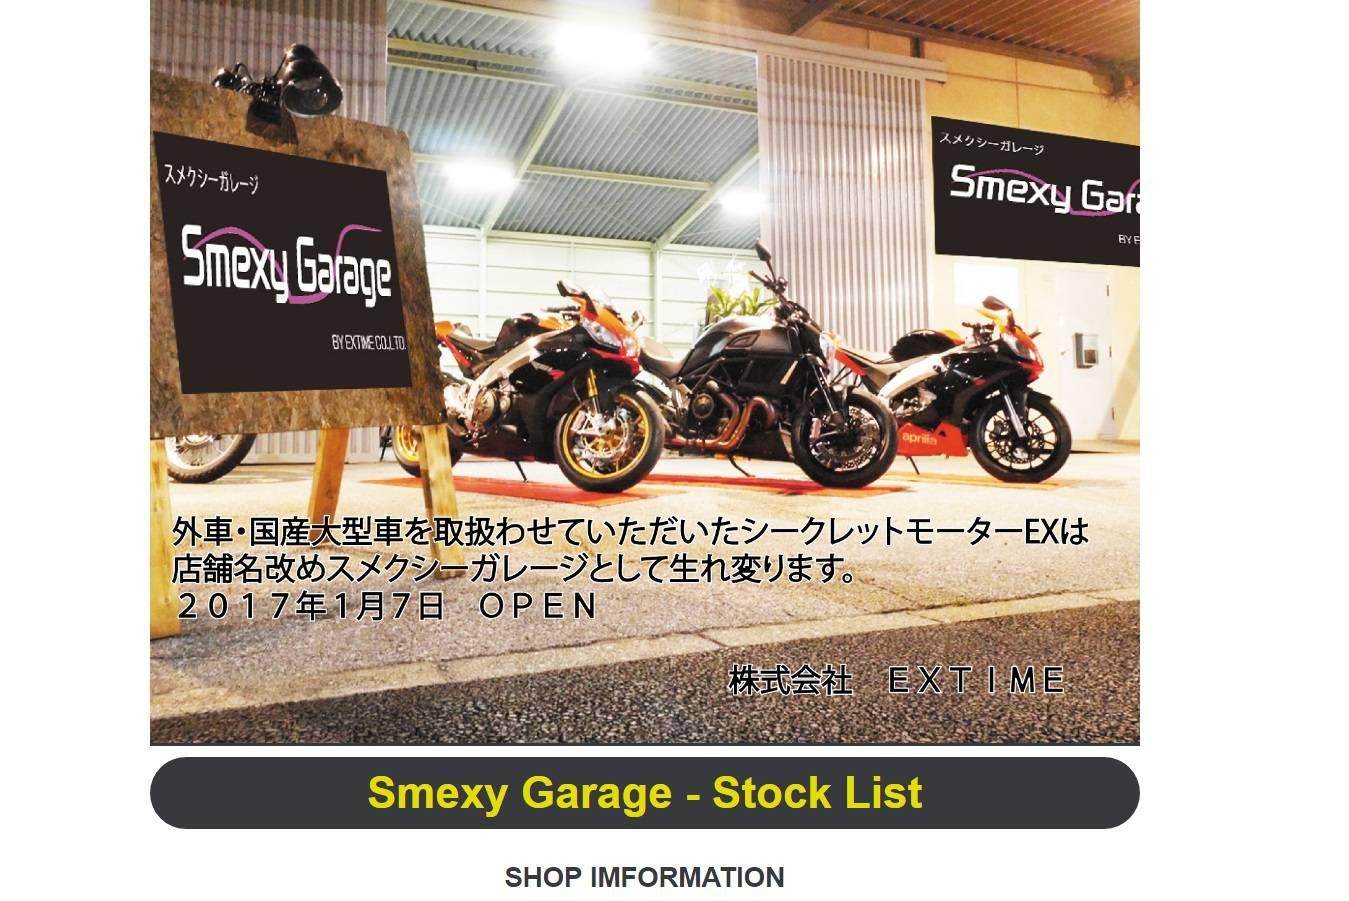 Smexy Garage(スメクシーガレージ)